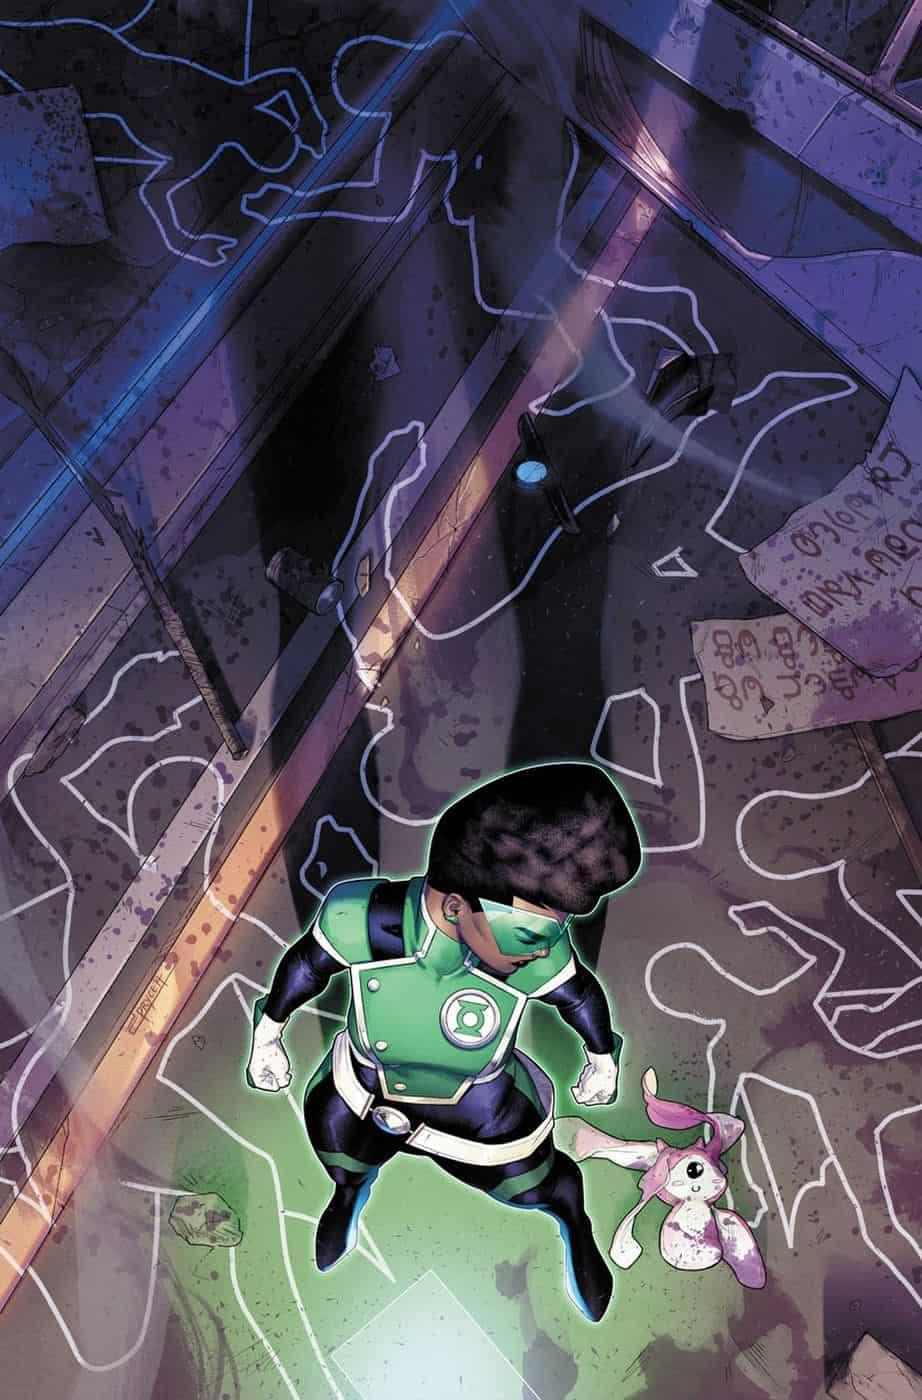 Best Comics Of 2020.Dc Comics Universe February 2020 Solicitations Spoilers